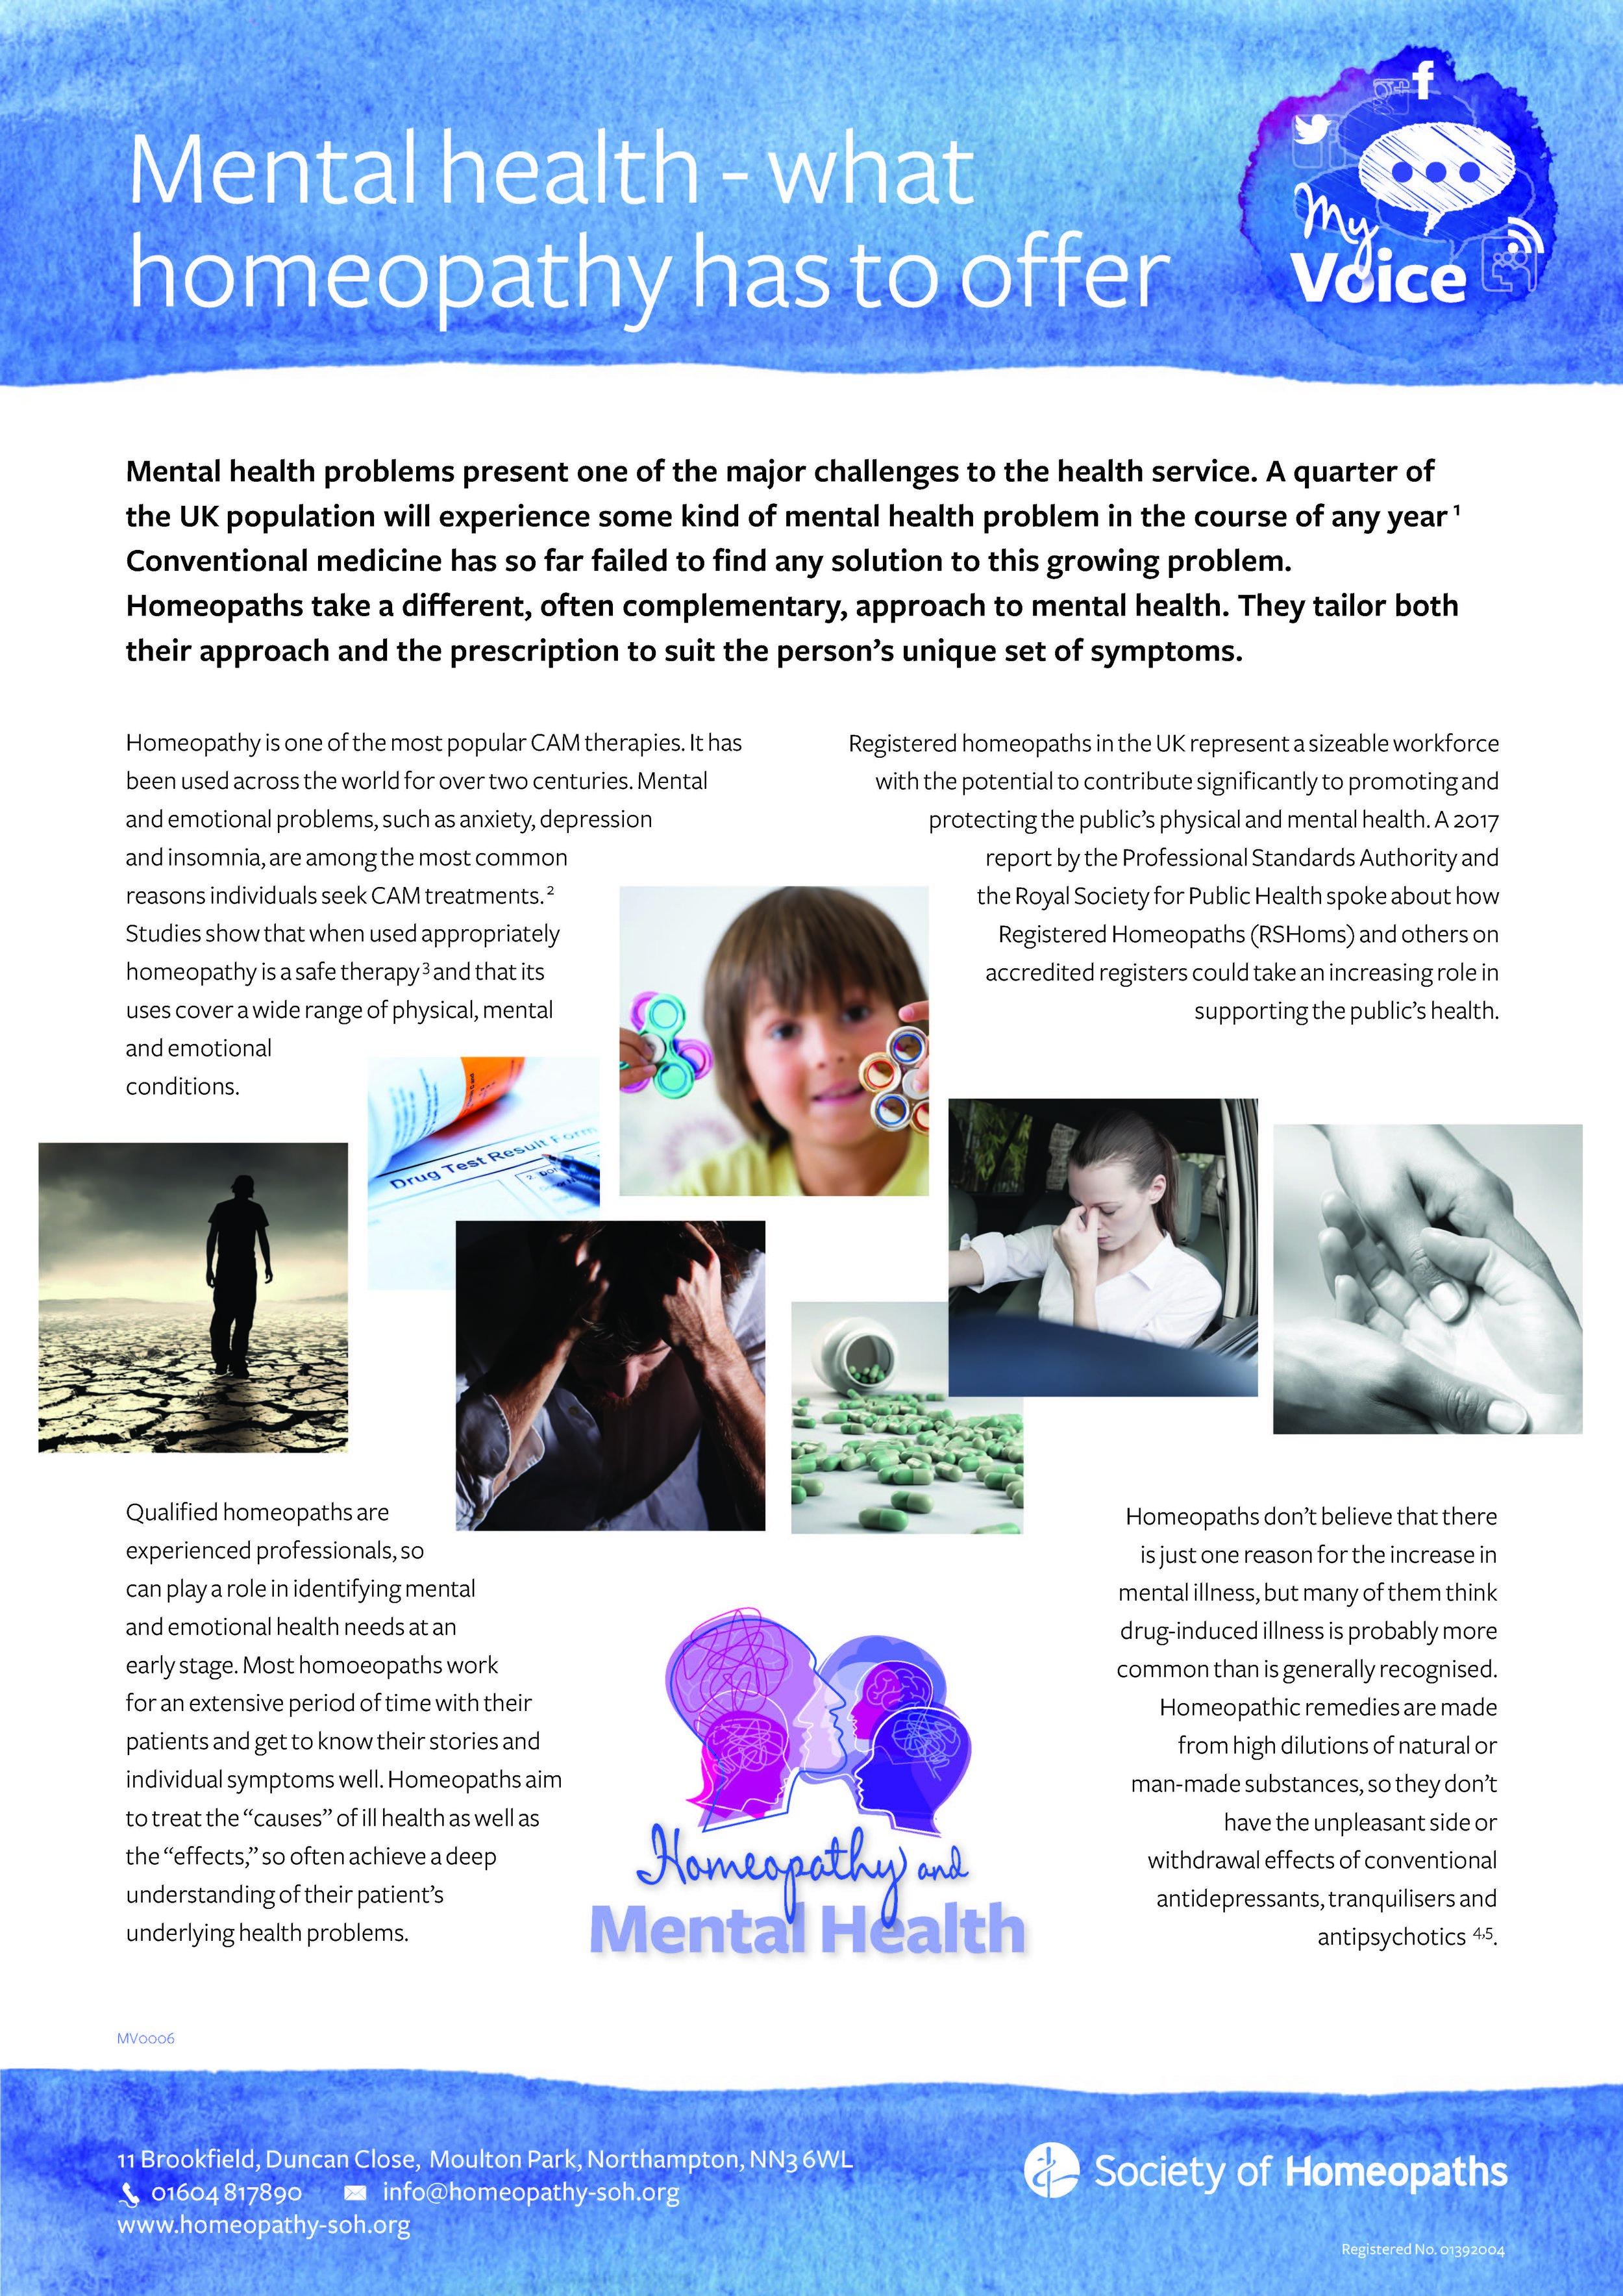 soh_mentalHealth_homeopathy_Page_1.jpg